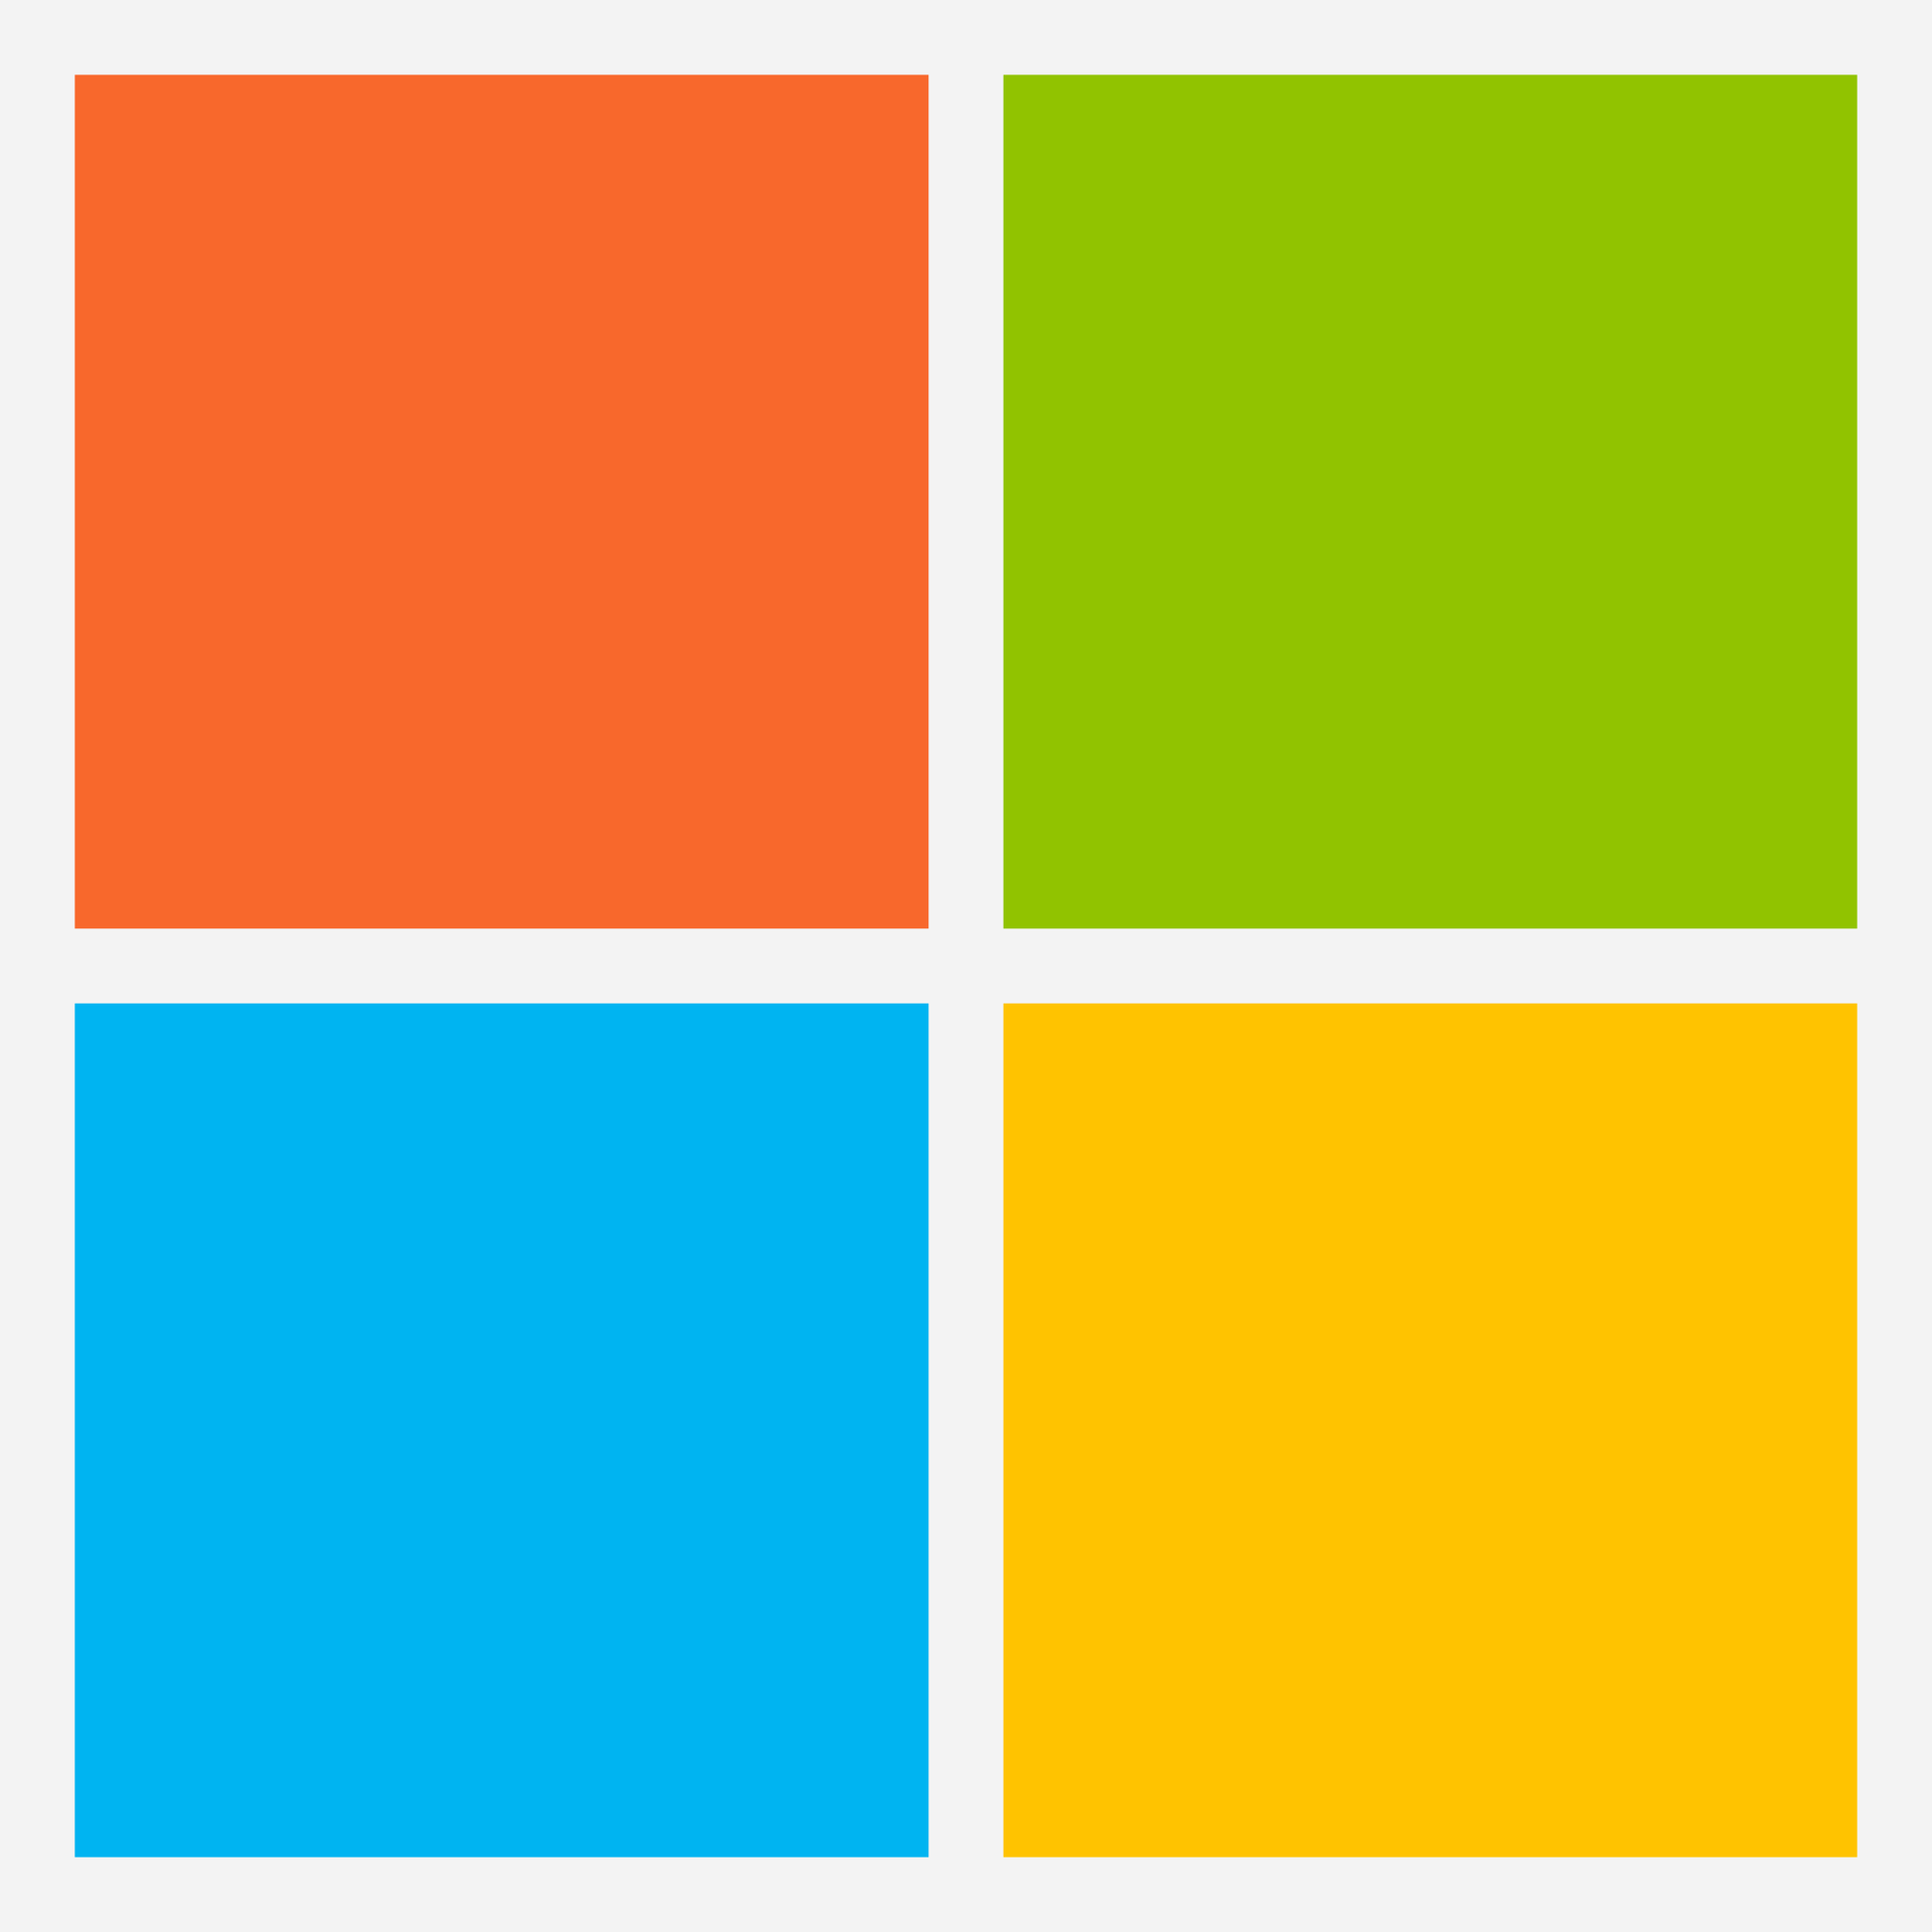 microsoft_logo_svg.png